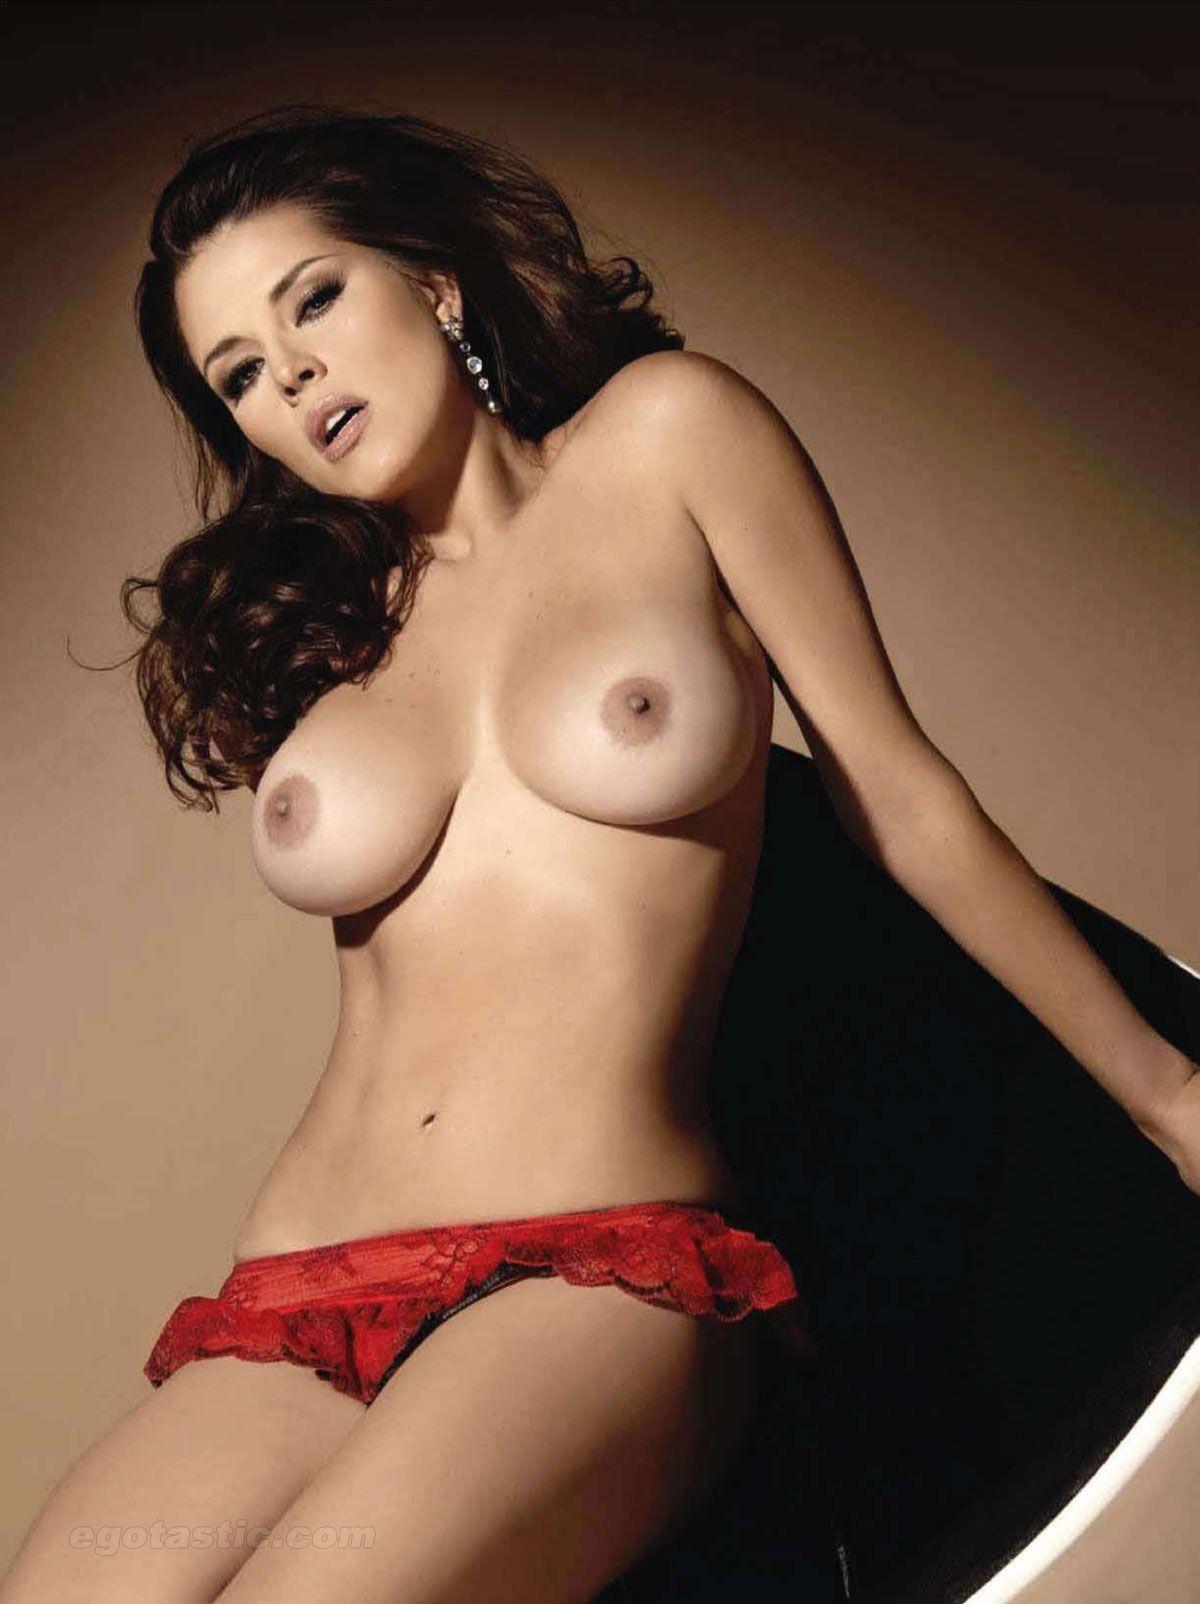 body building female hardcore porn